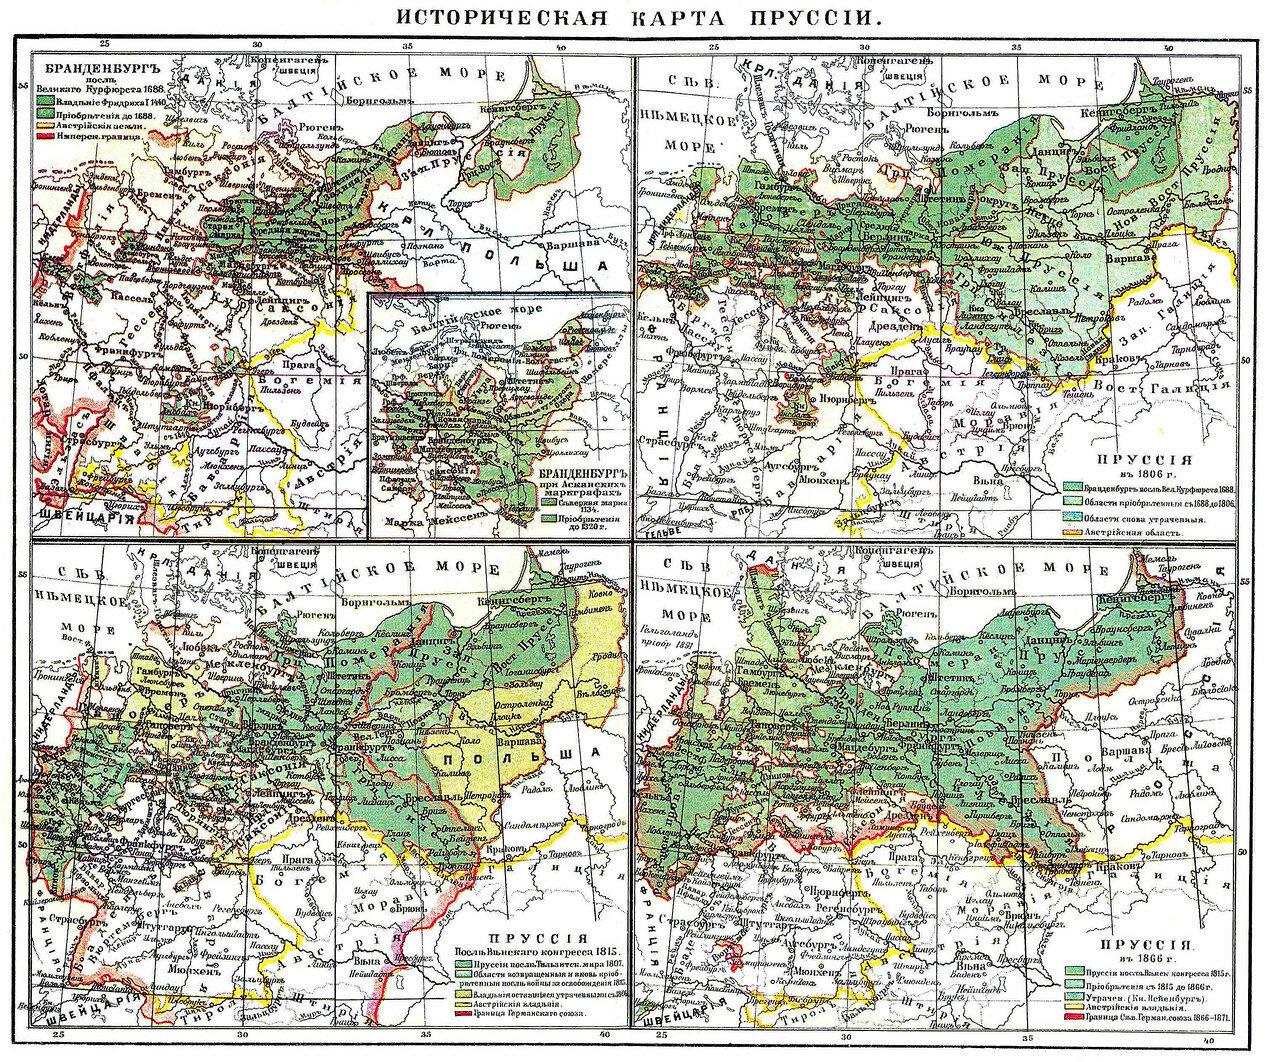 Пруссия (ХII век-1866)